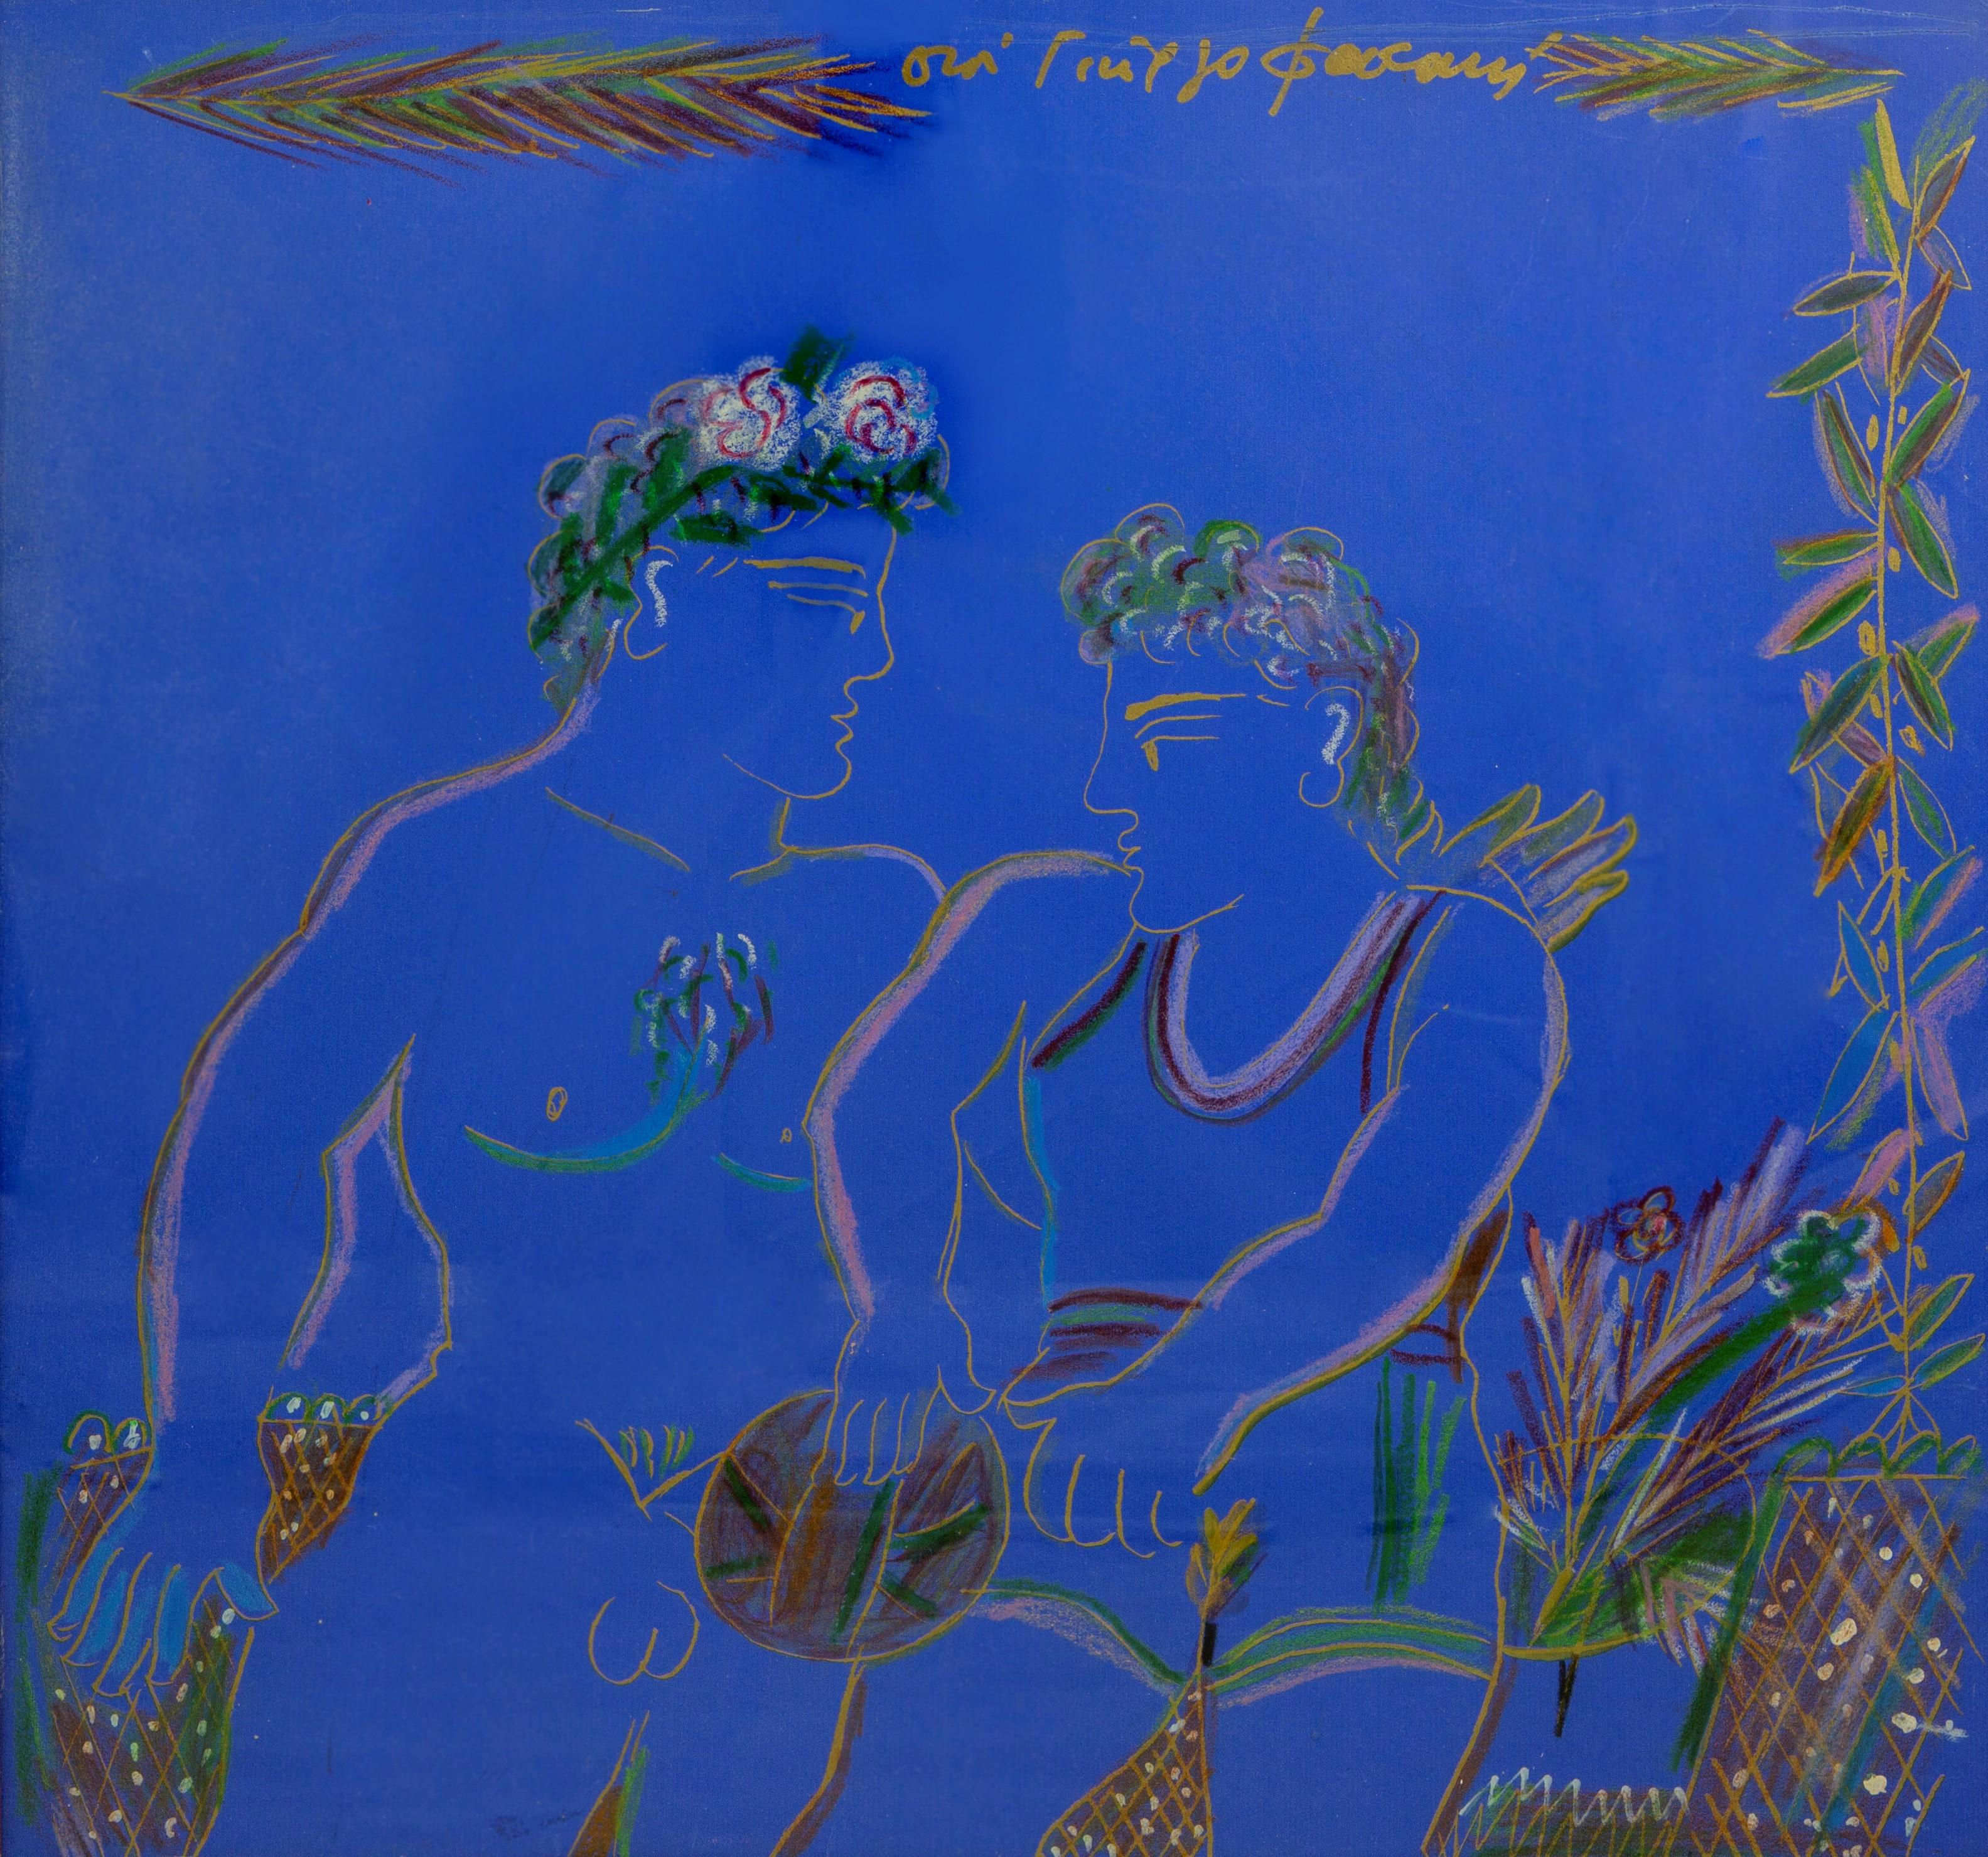 Alekos Fassianos (Greek, born 1935), hand colored lithograph dedicated to Giorgos